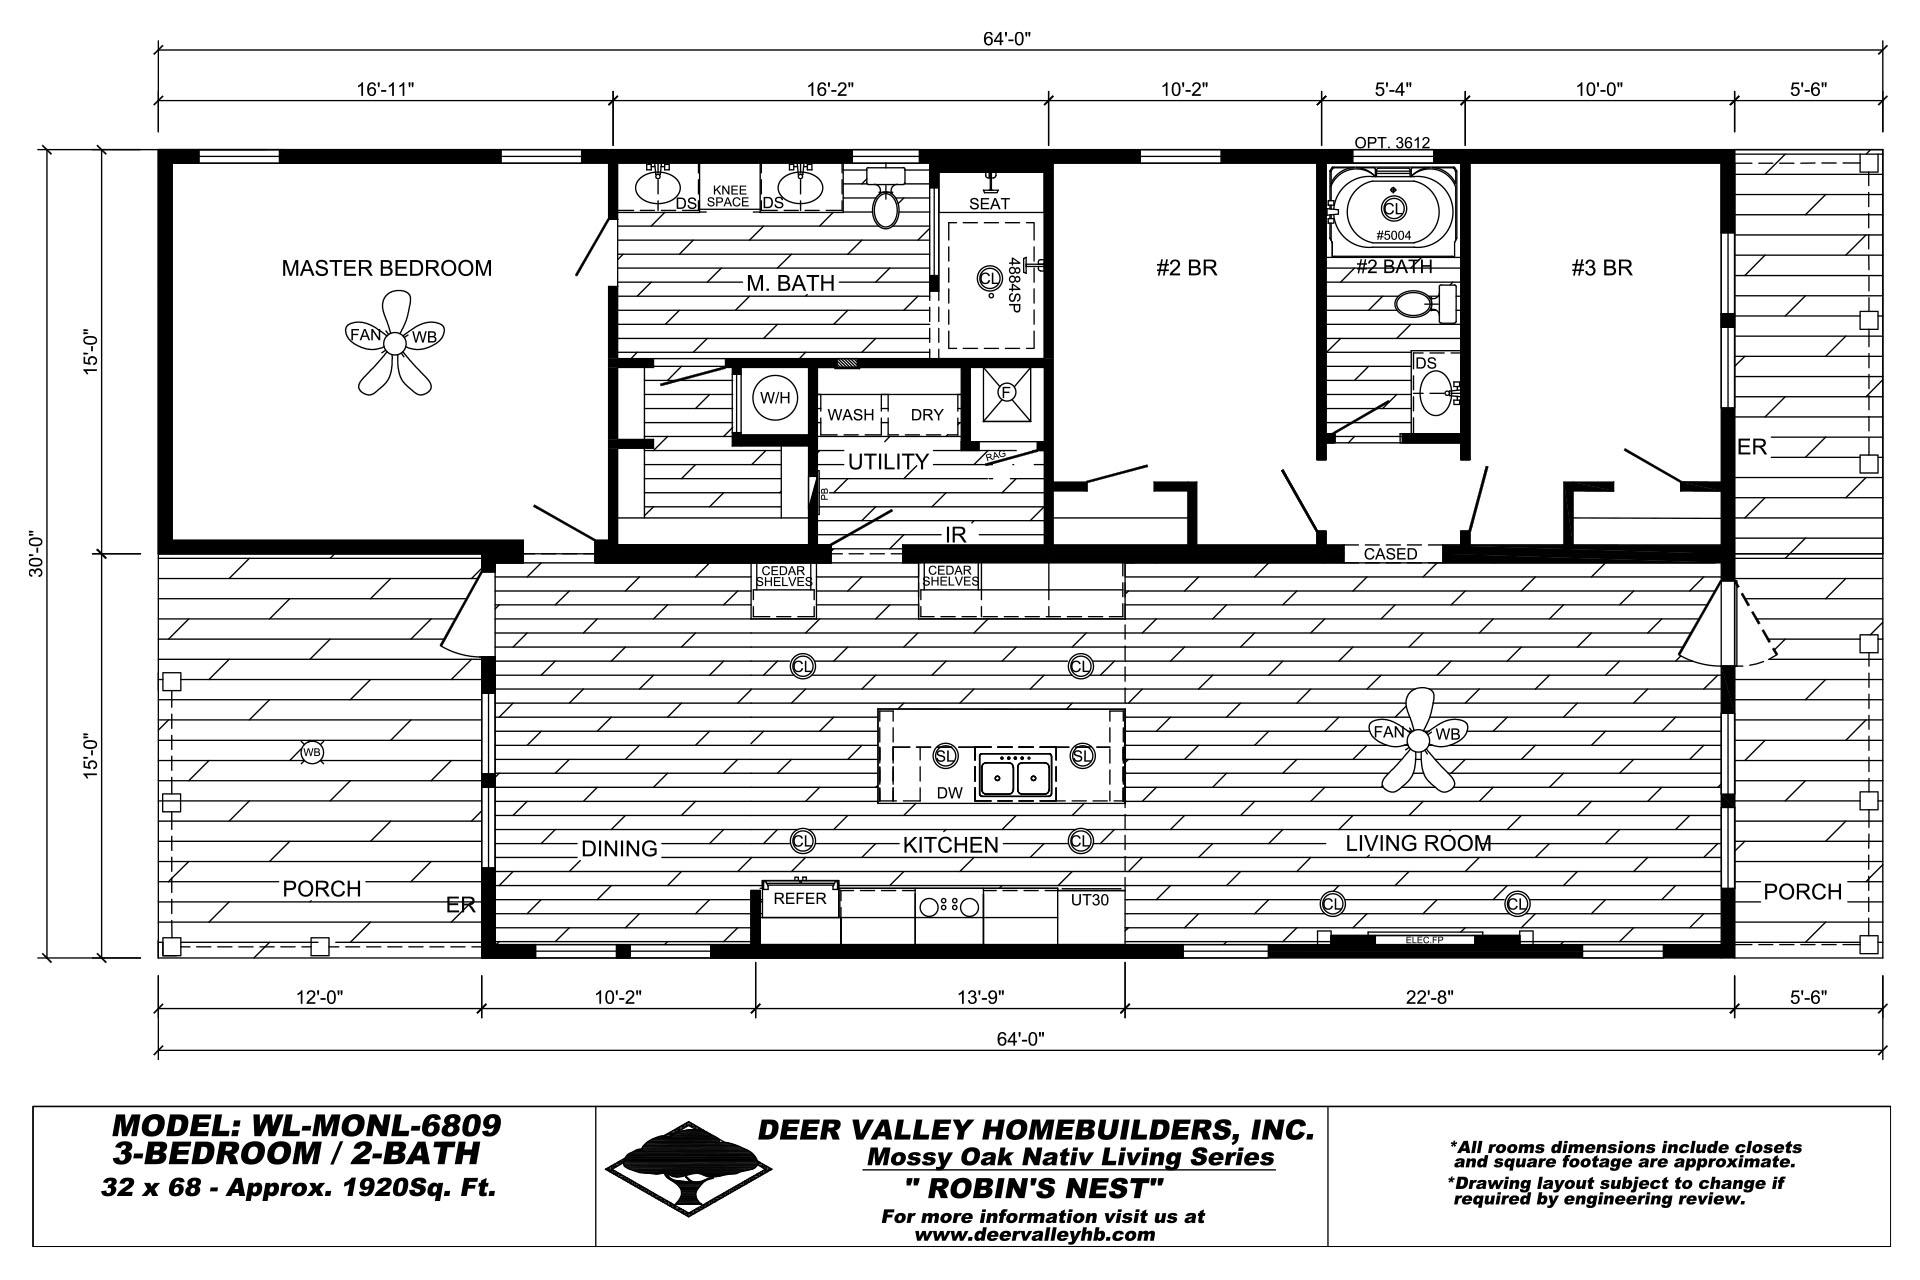 Deer Valley Homebuilders - Mossy Oak Nativ Living - WL-MONL-6809-Floor Plan 21